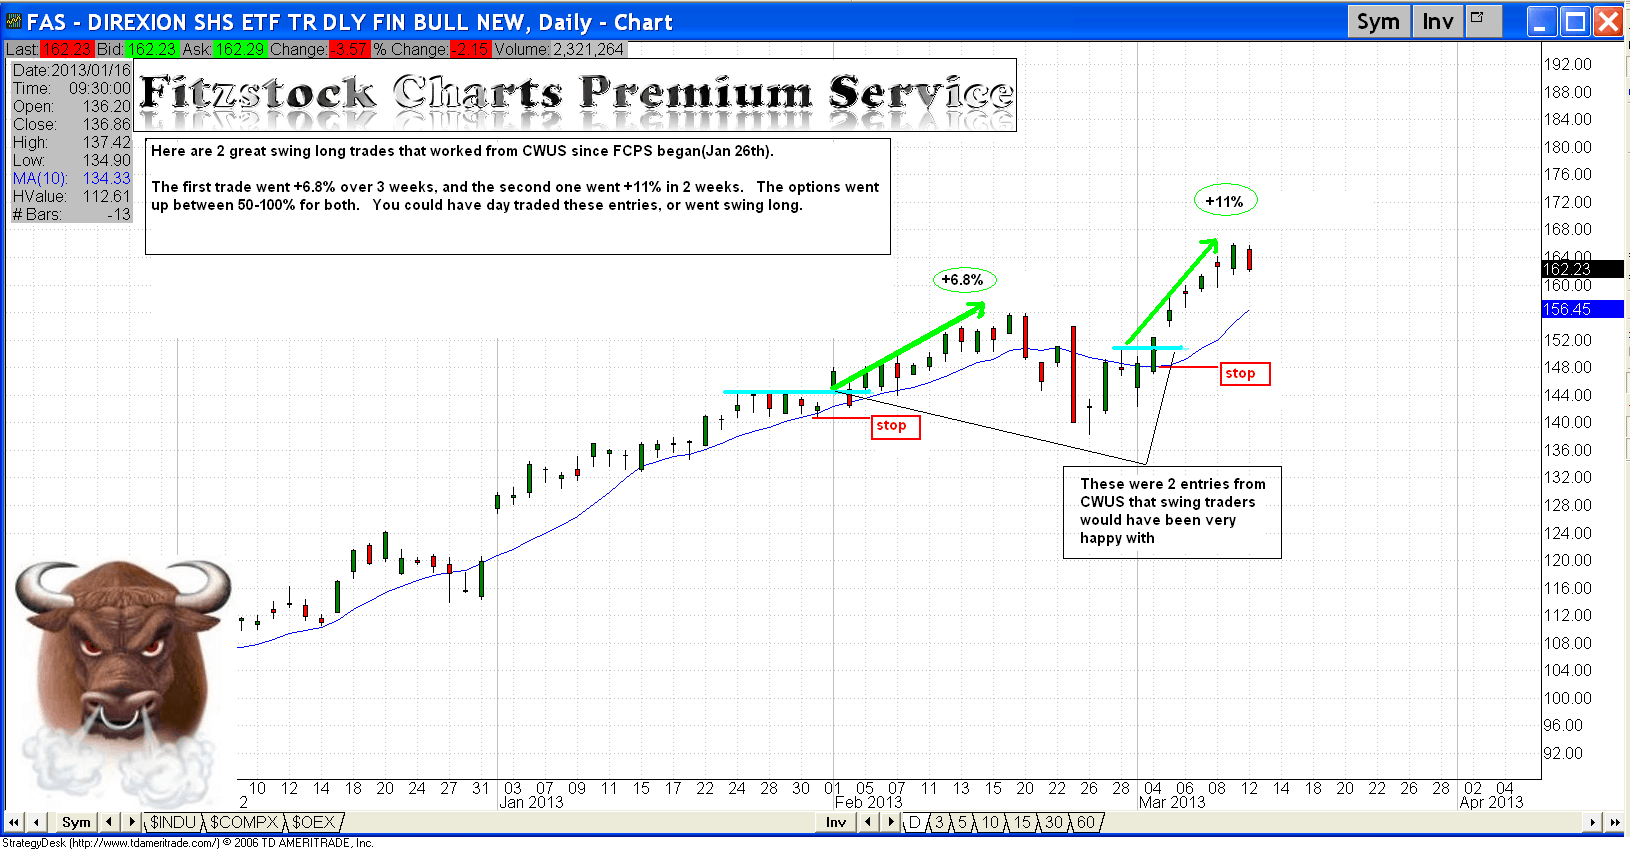 Swing vs Day trade - Fitzstock Charts